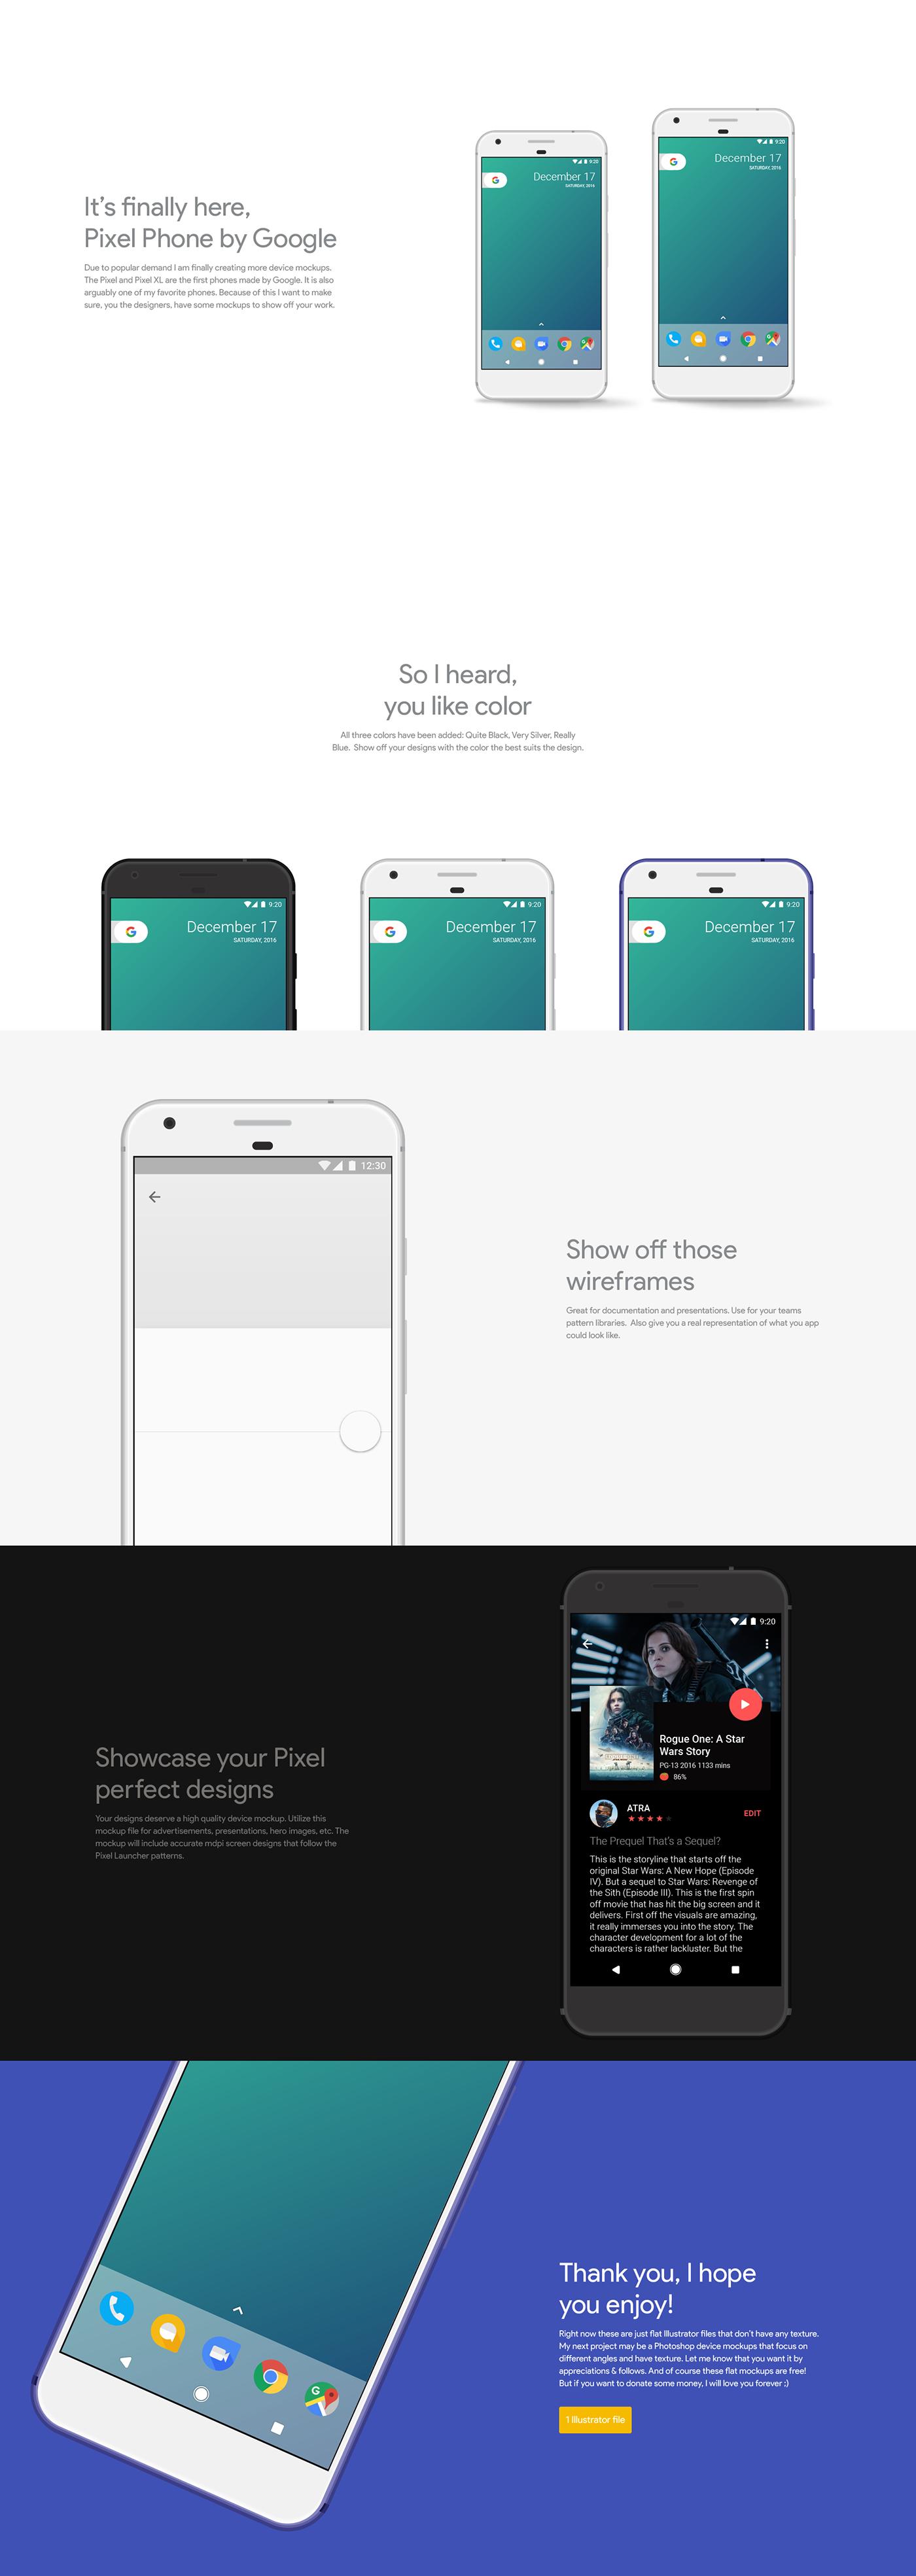 pixel Pixel XL google android mockups Illustrator Nougat Pixel Launcher nexus atra